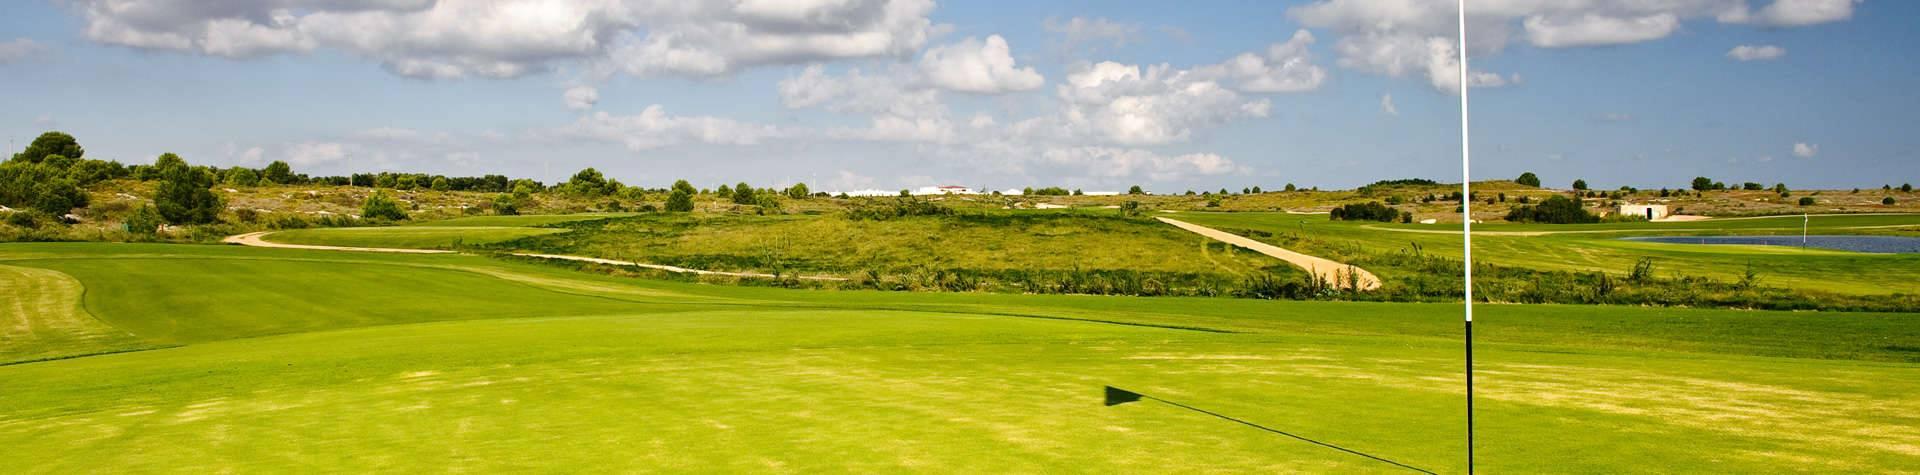 Salento, Acaya: non solo storia, ma anche golf